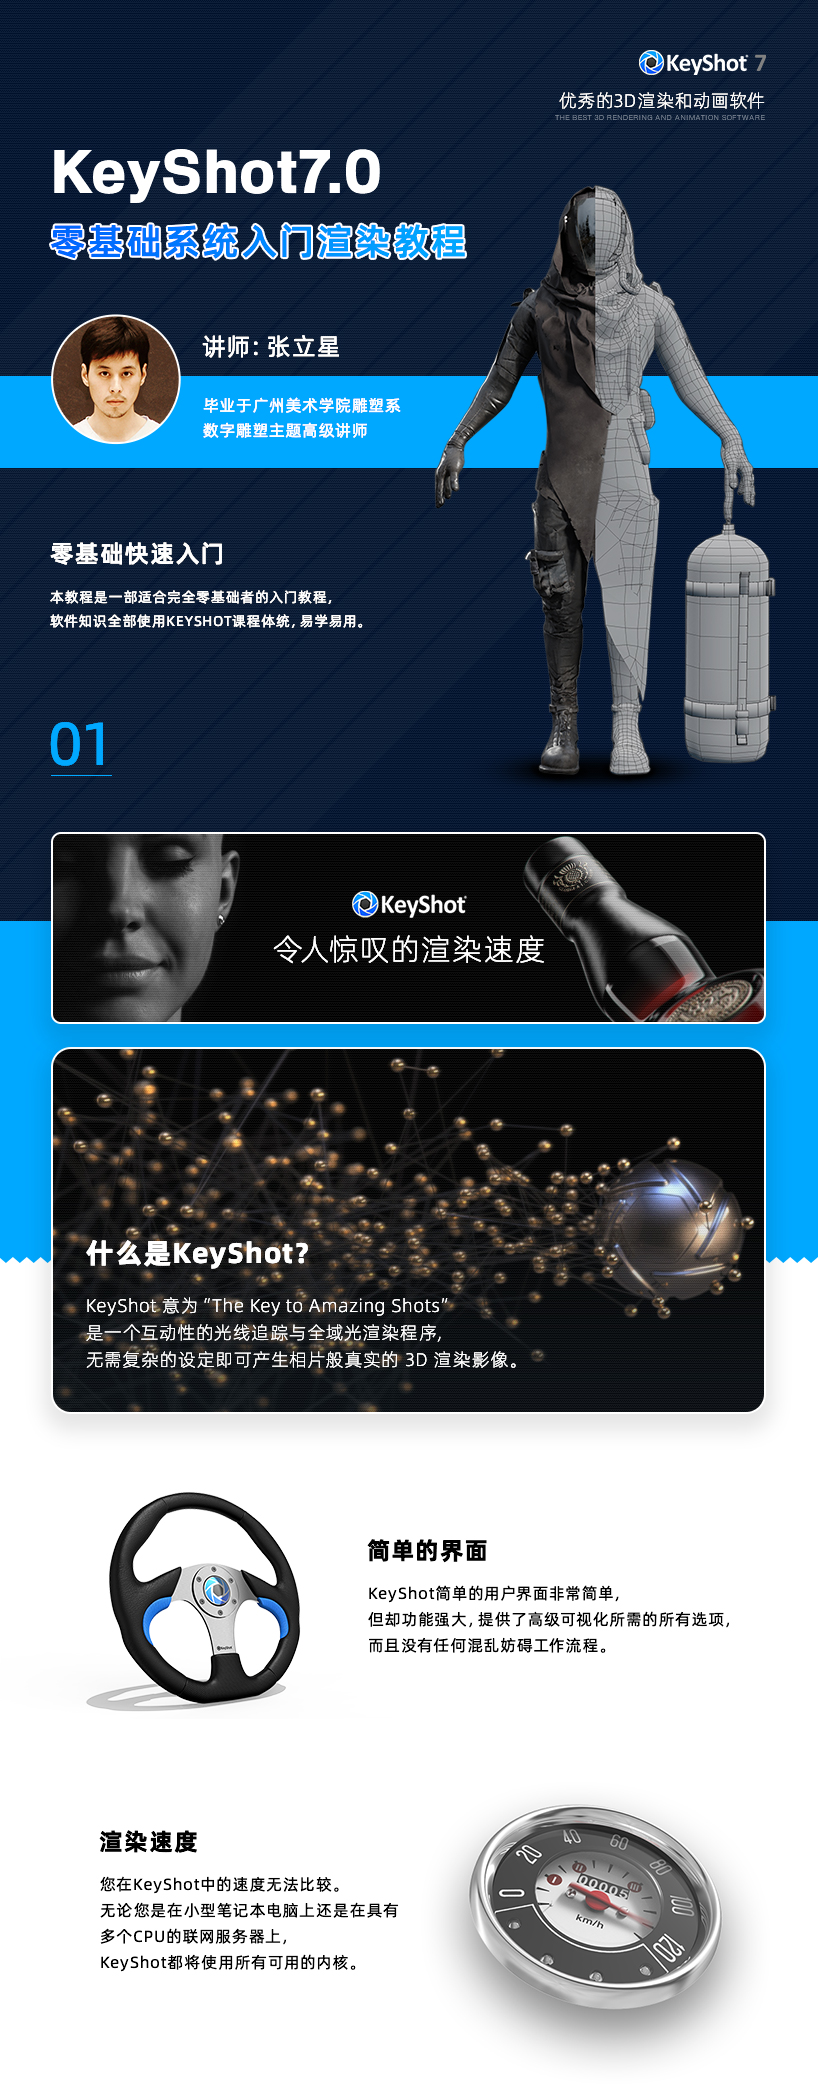 keyshot_02.jpg